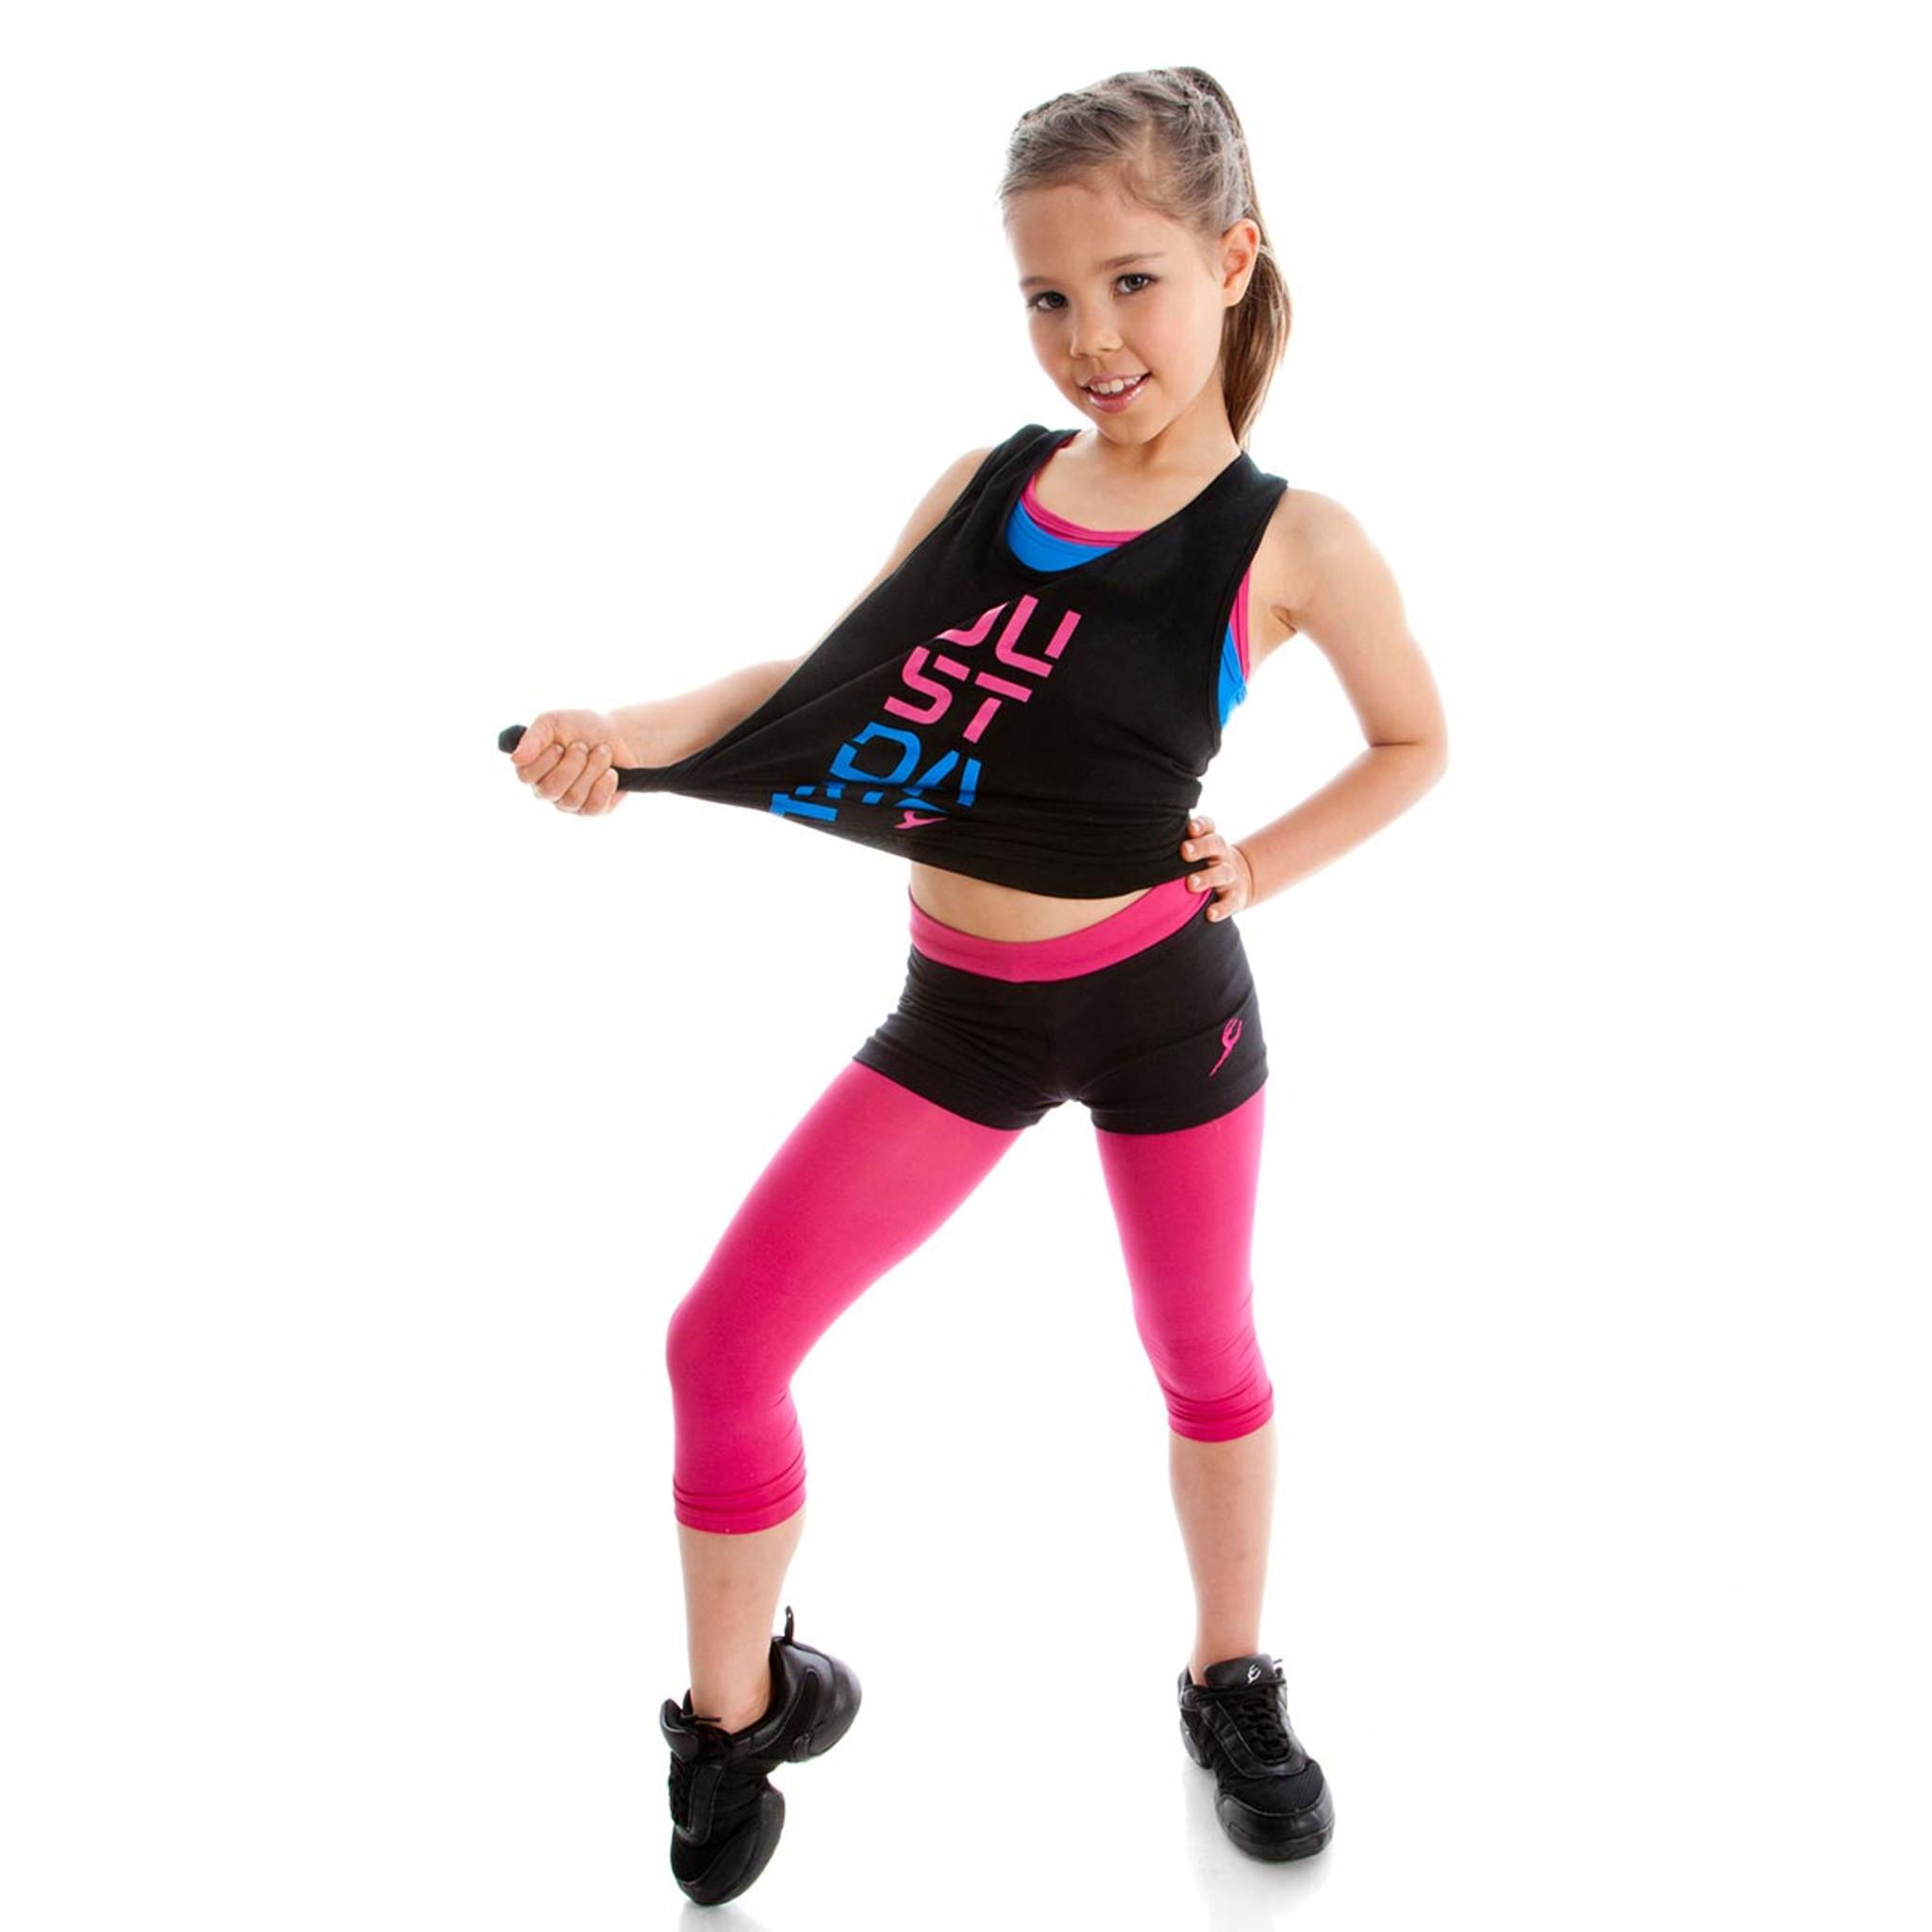 Energetiks Straight  Band  Dance Shorts Girls